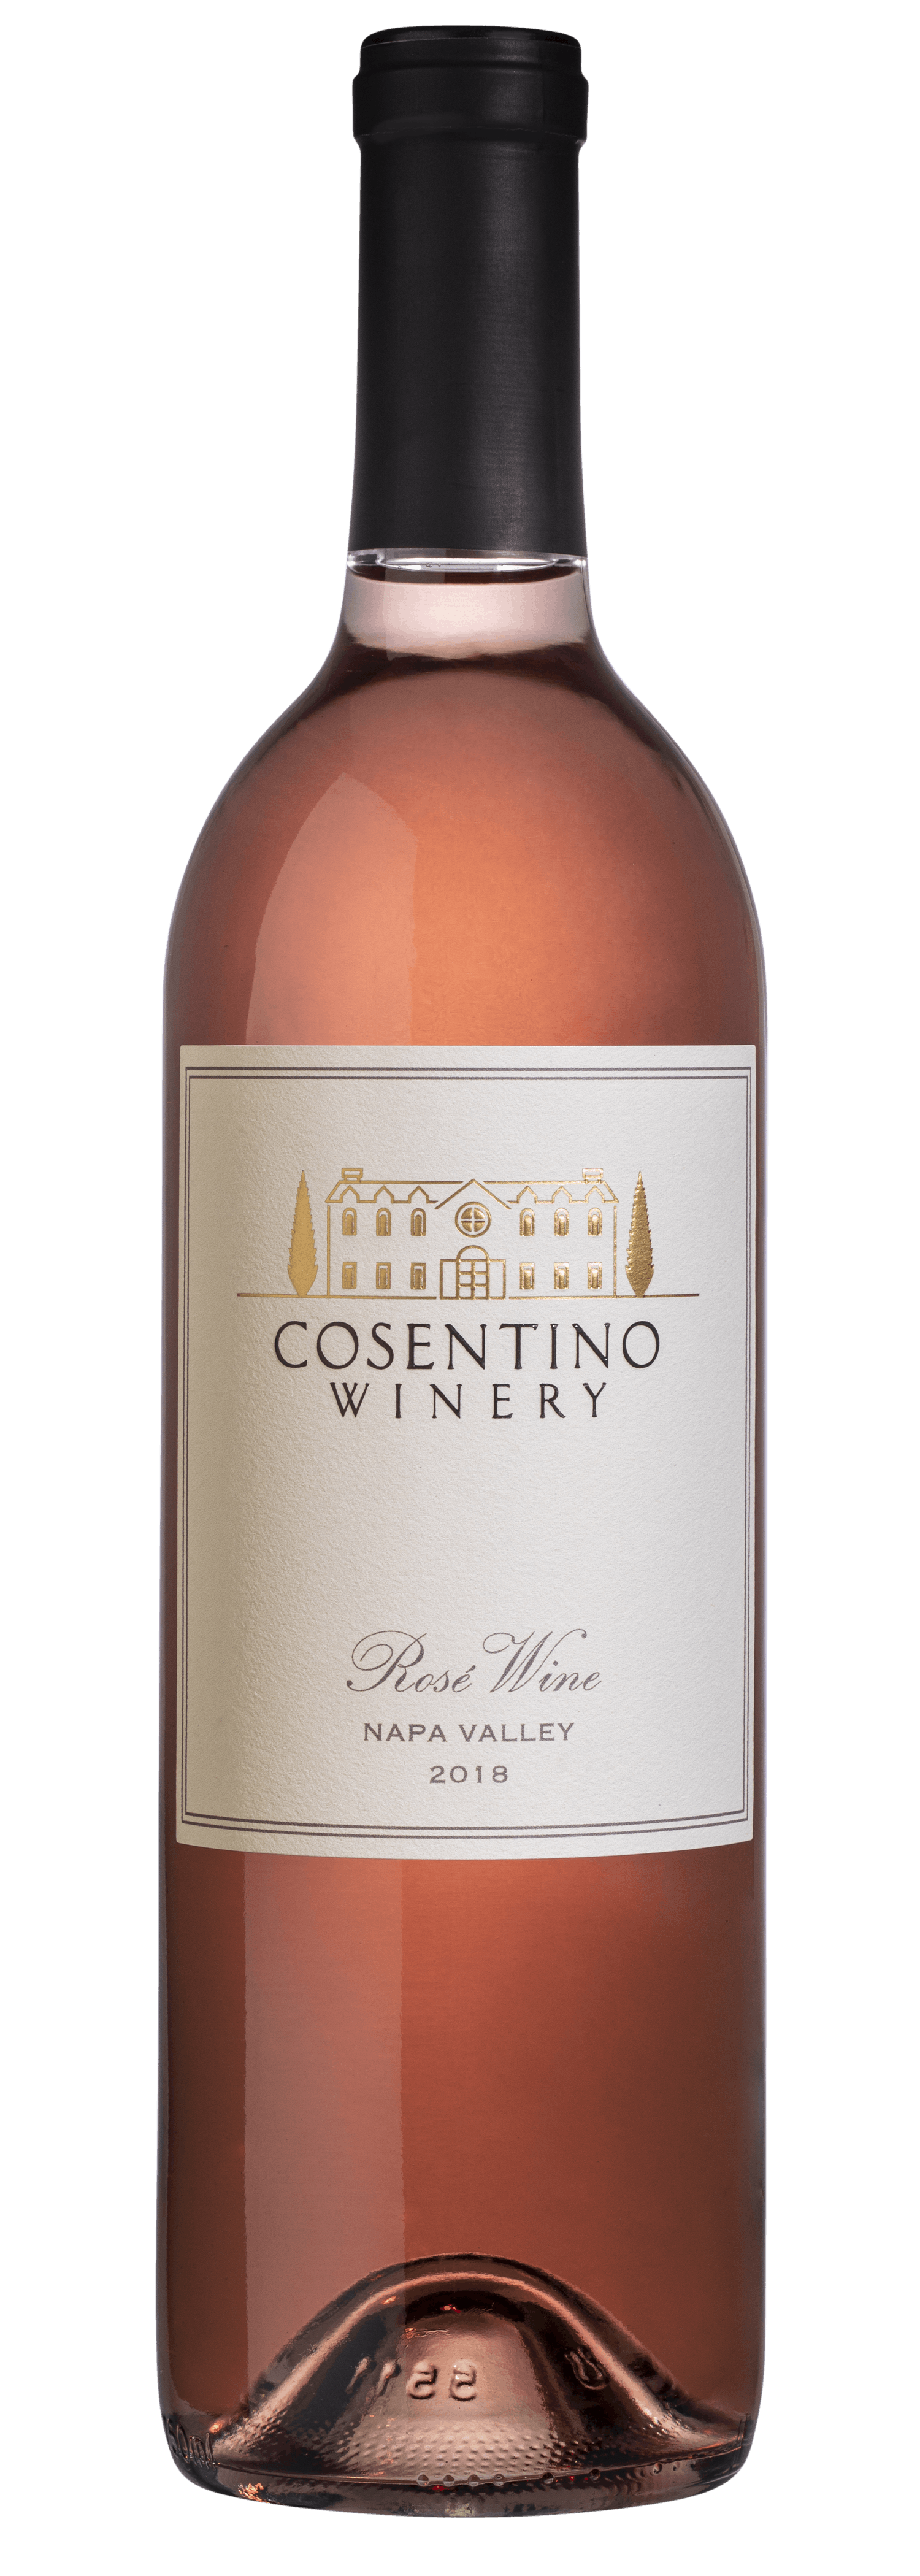 2018 Cosentino Winery Rosé, Napa Valley, 750ml